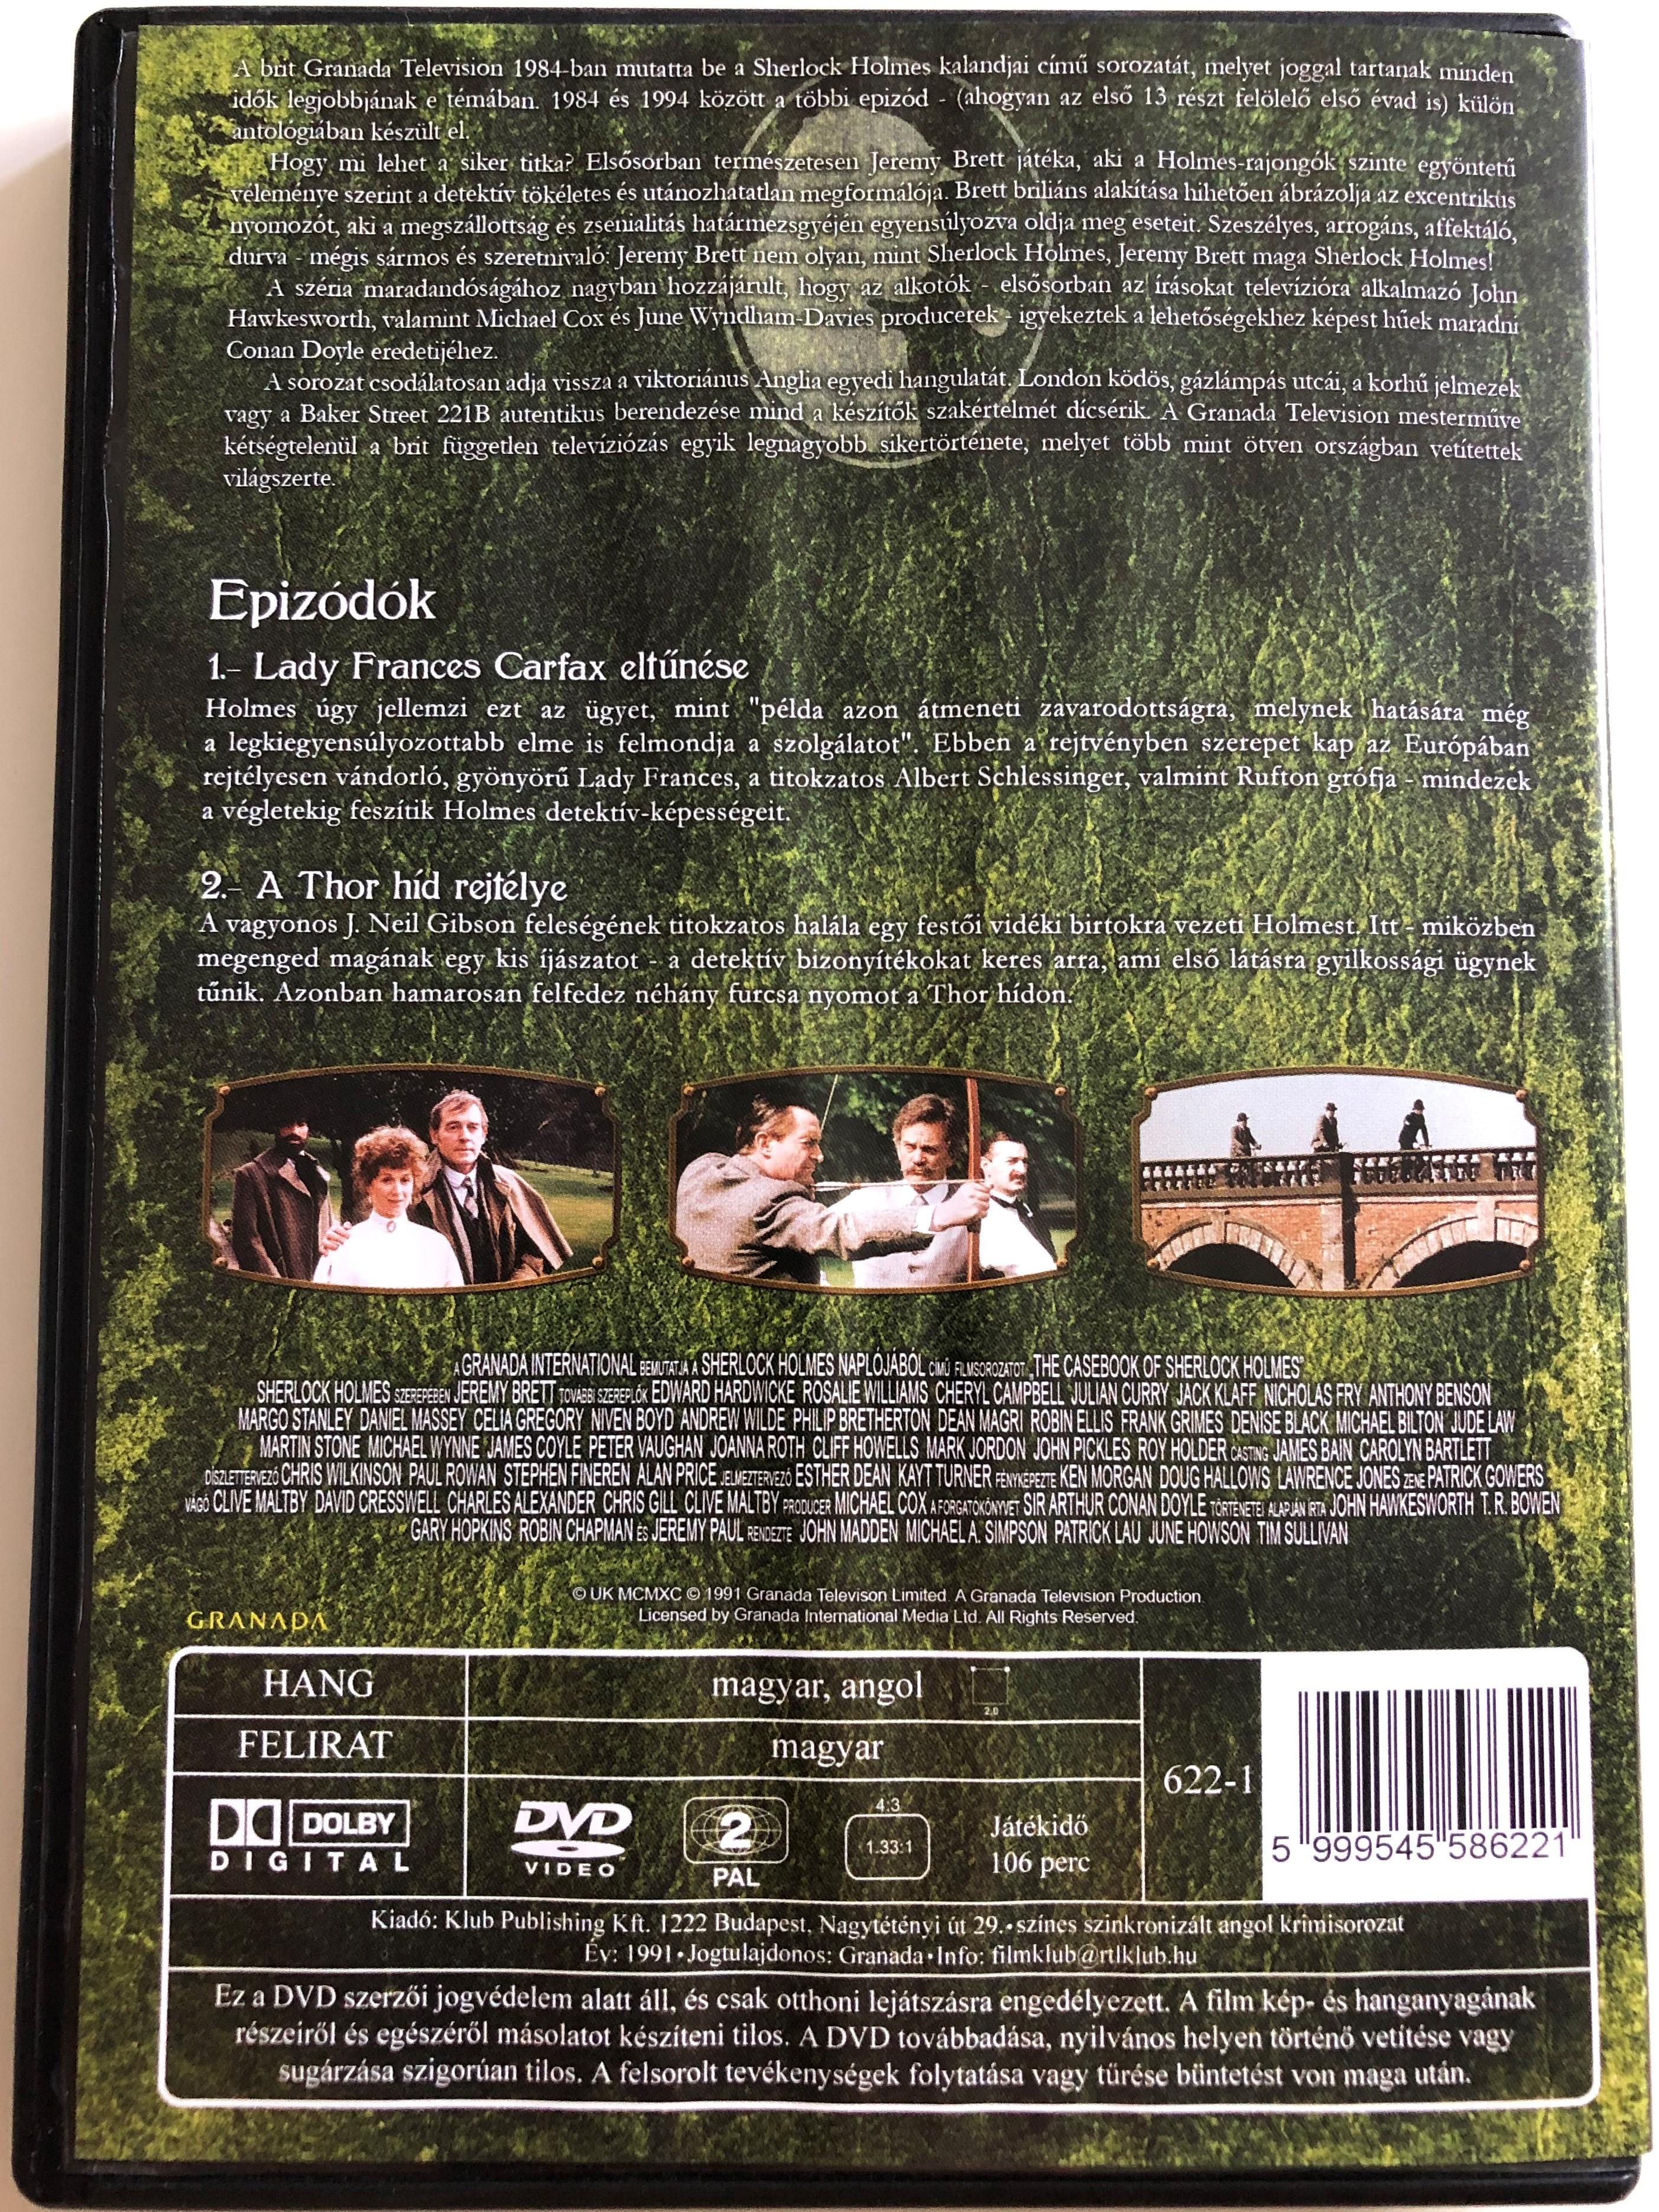 the-casebook-of-sherlock-holmes-1.-dvd-1991-sherlock-holmes-napl-j-b-l-directed-by-john-madden-michael-a.-simpson-starring-jeremy-brett-edward-hardwicke-rosalie-williams-disc-1.-episodes-1-2-sir-a.-conan-doyle-2-.jpg